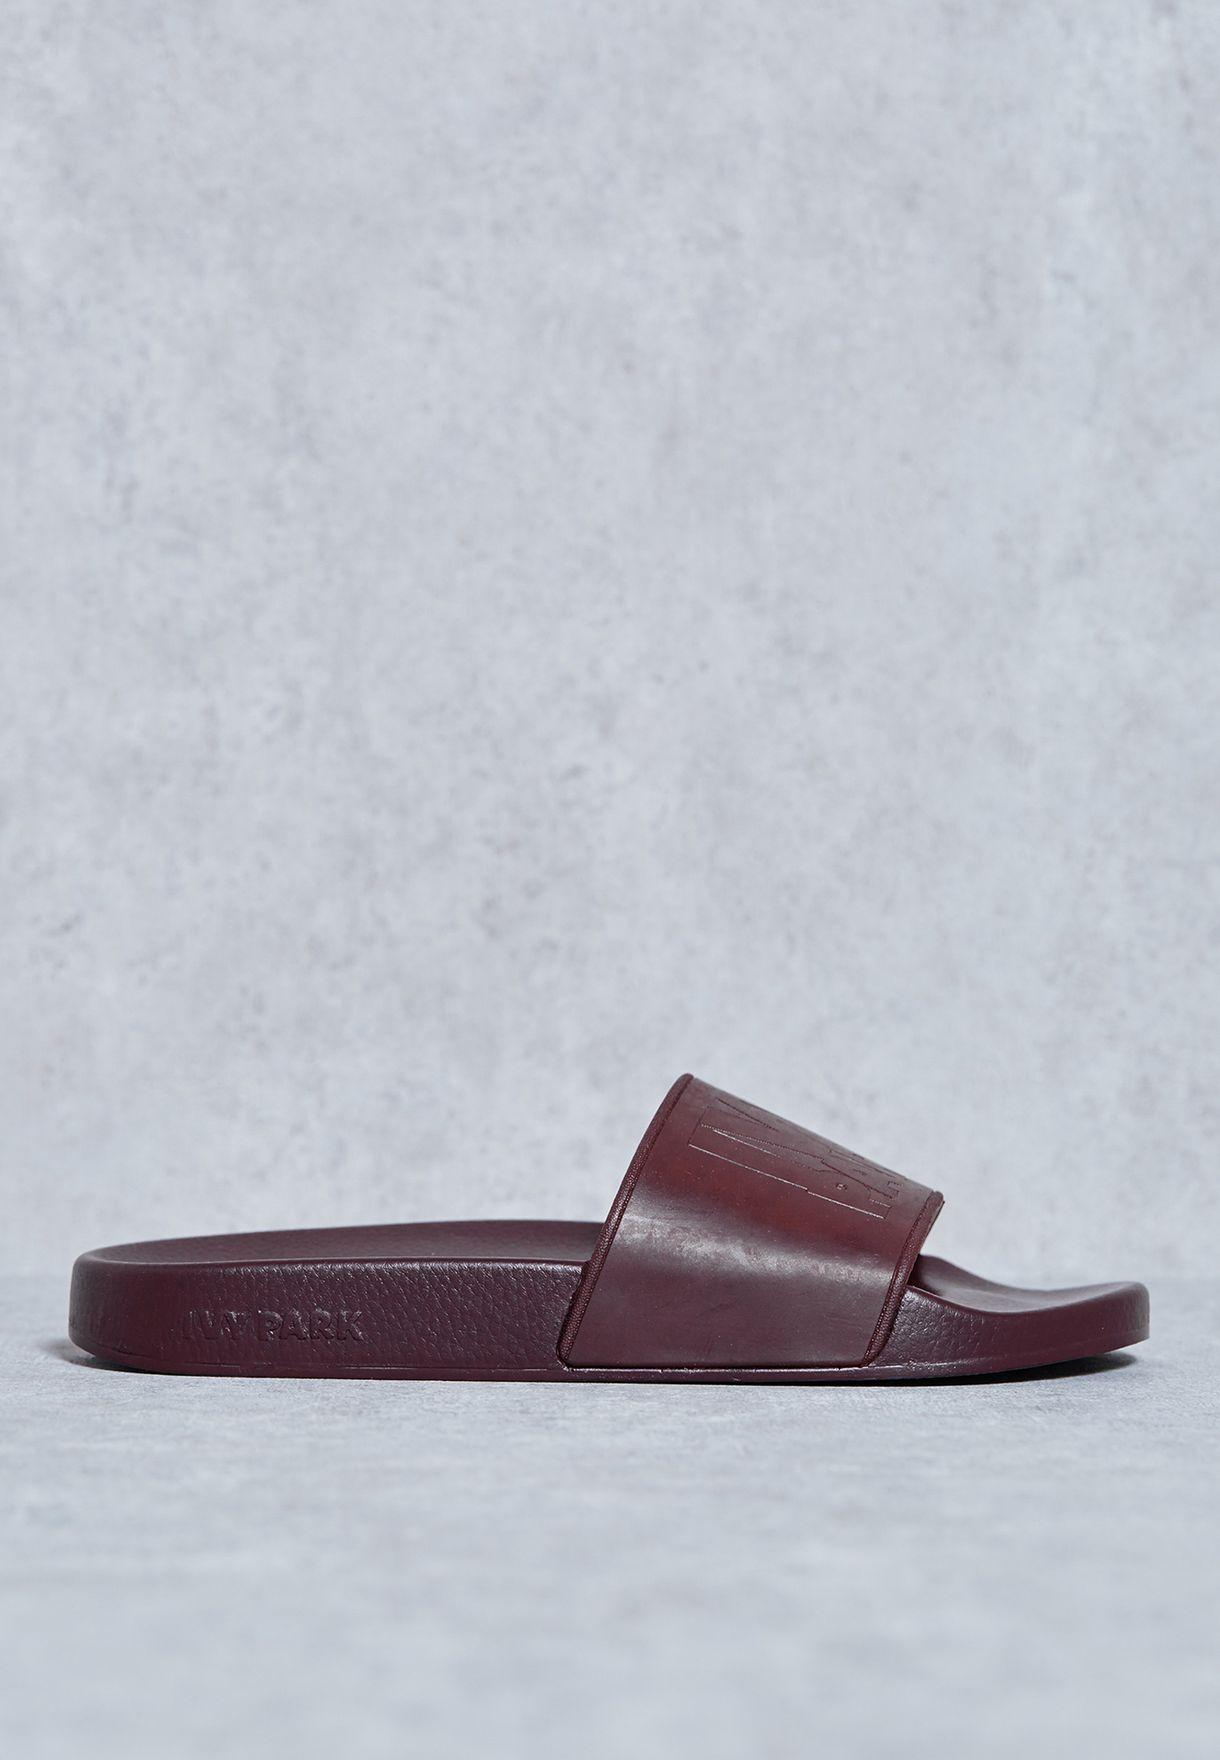 61a90e050e59 Shop Ivy Park red Logo Slide Sandals 29E02KBRG for Women in Saudi ...